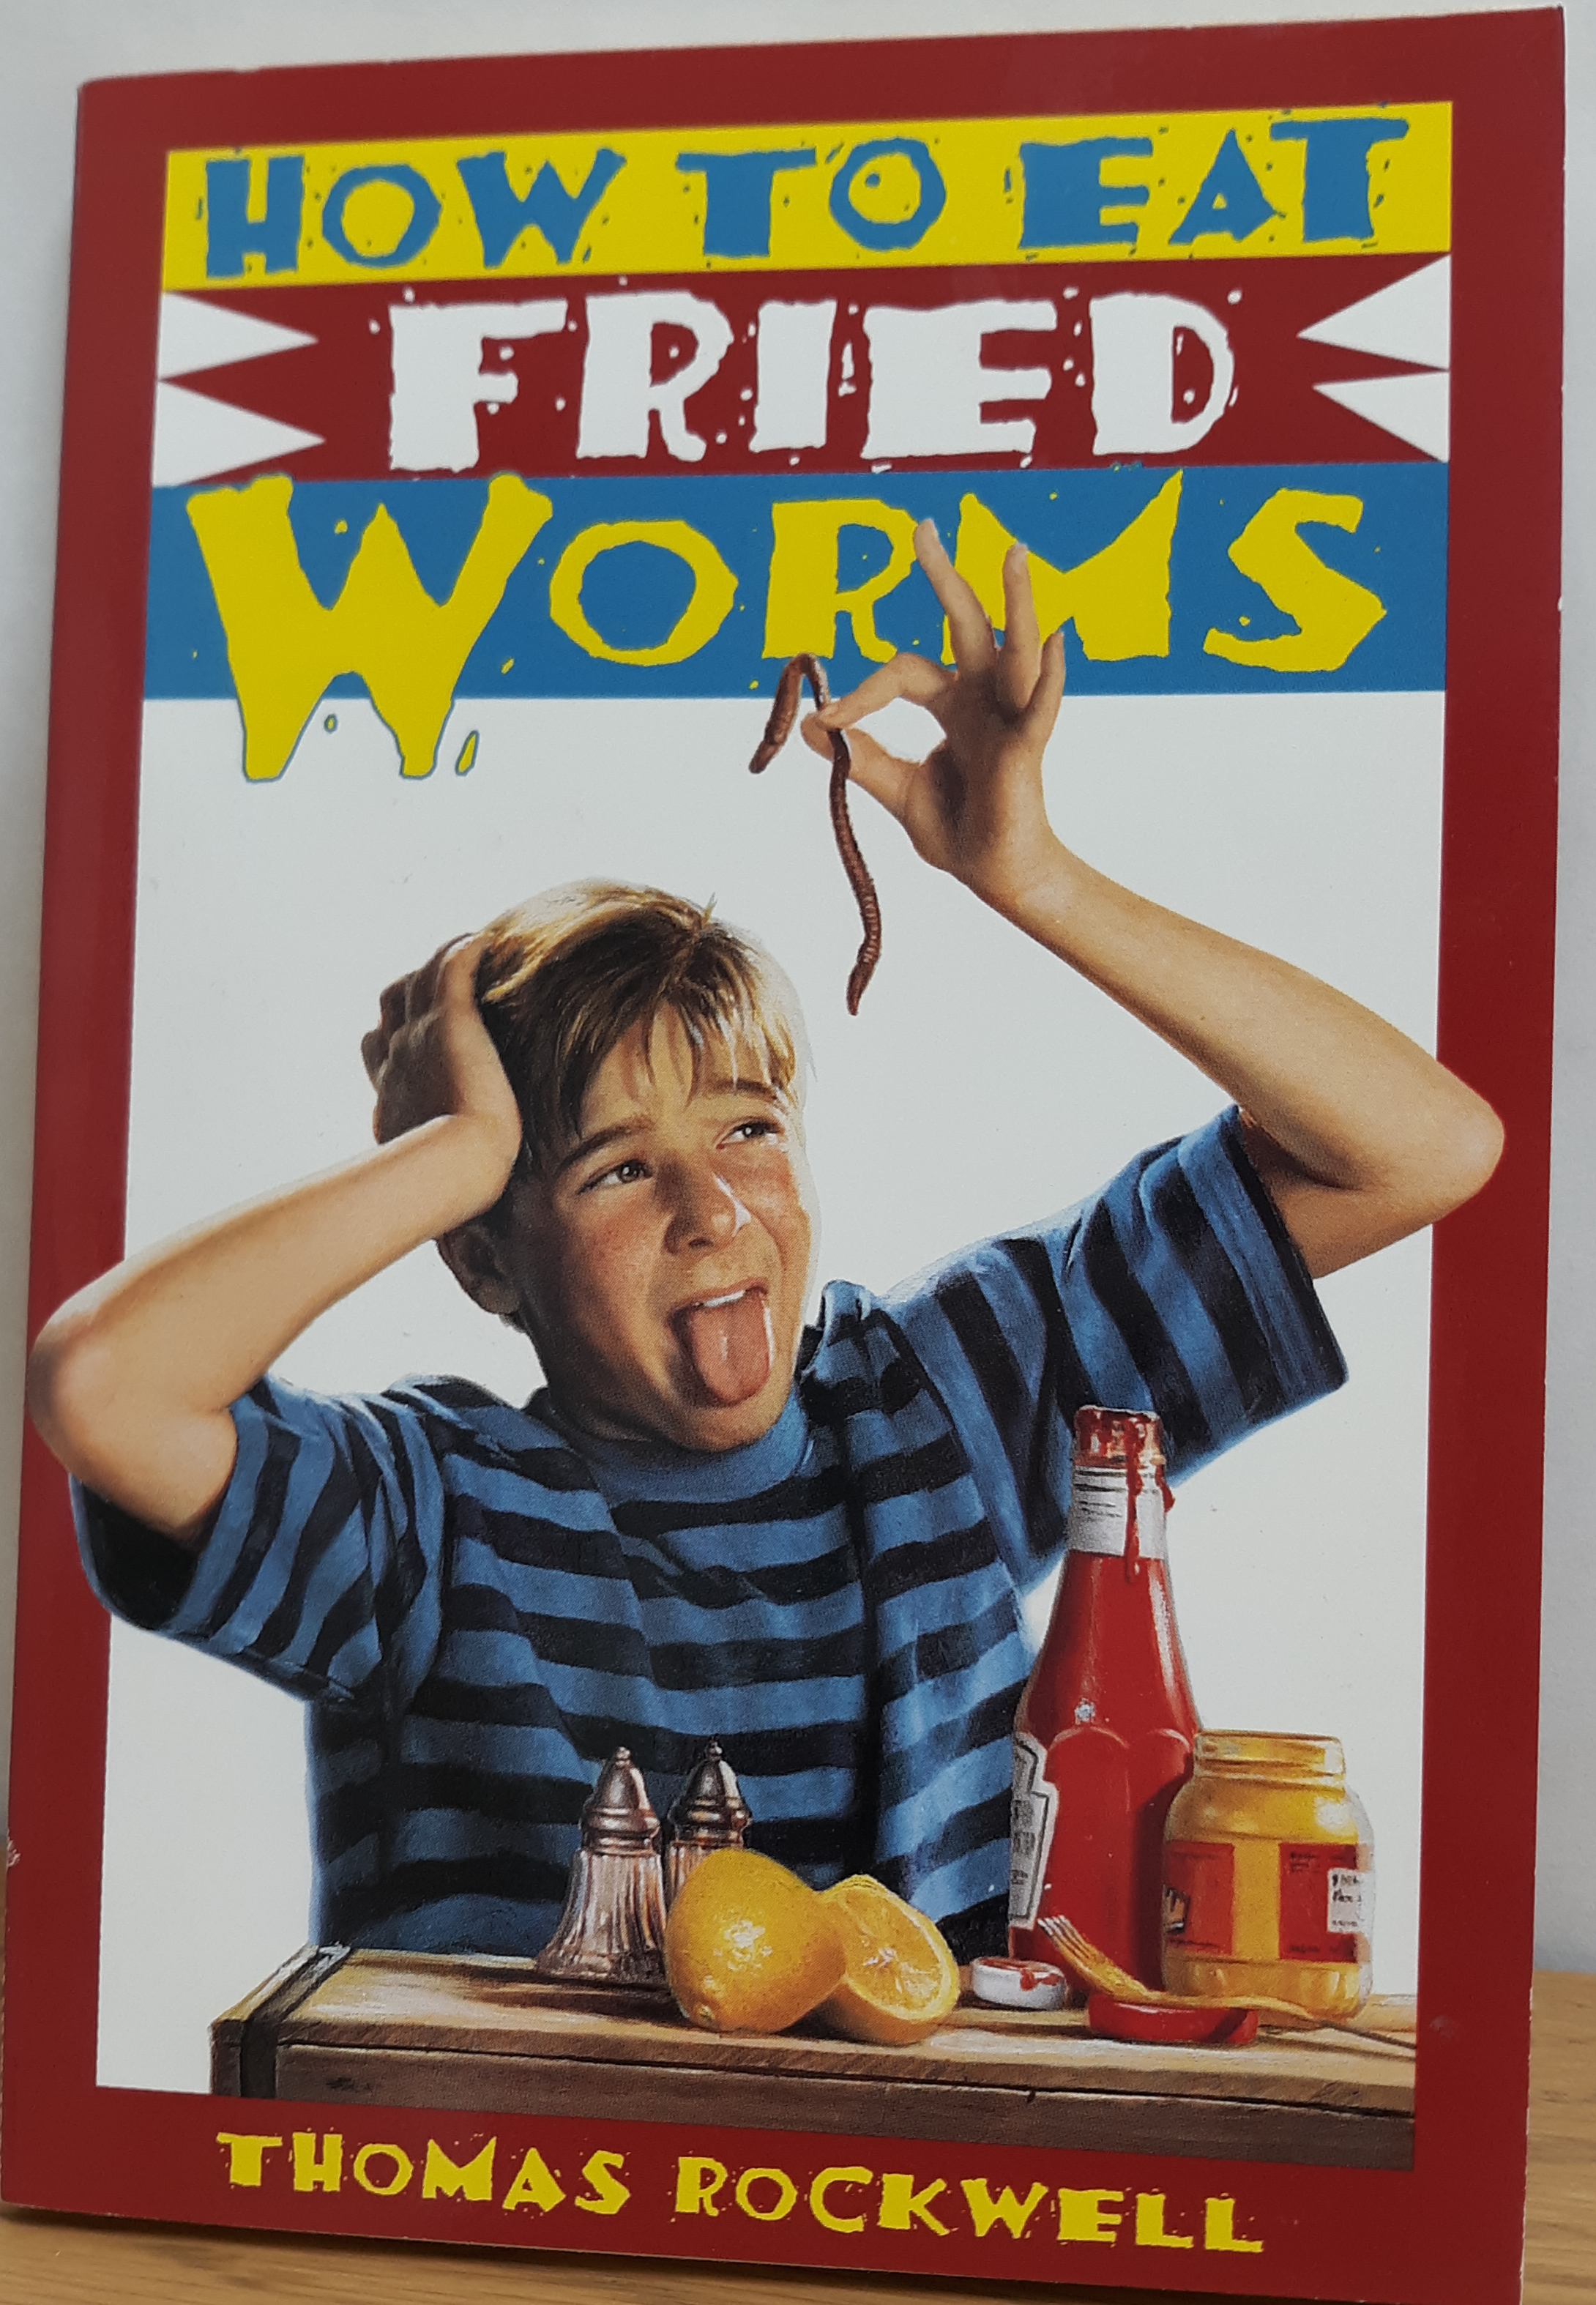 https://0201.nccdn.net/4_2/000/000/017/e75/how-to-eat-fried-worms.png